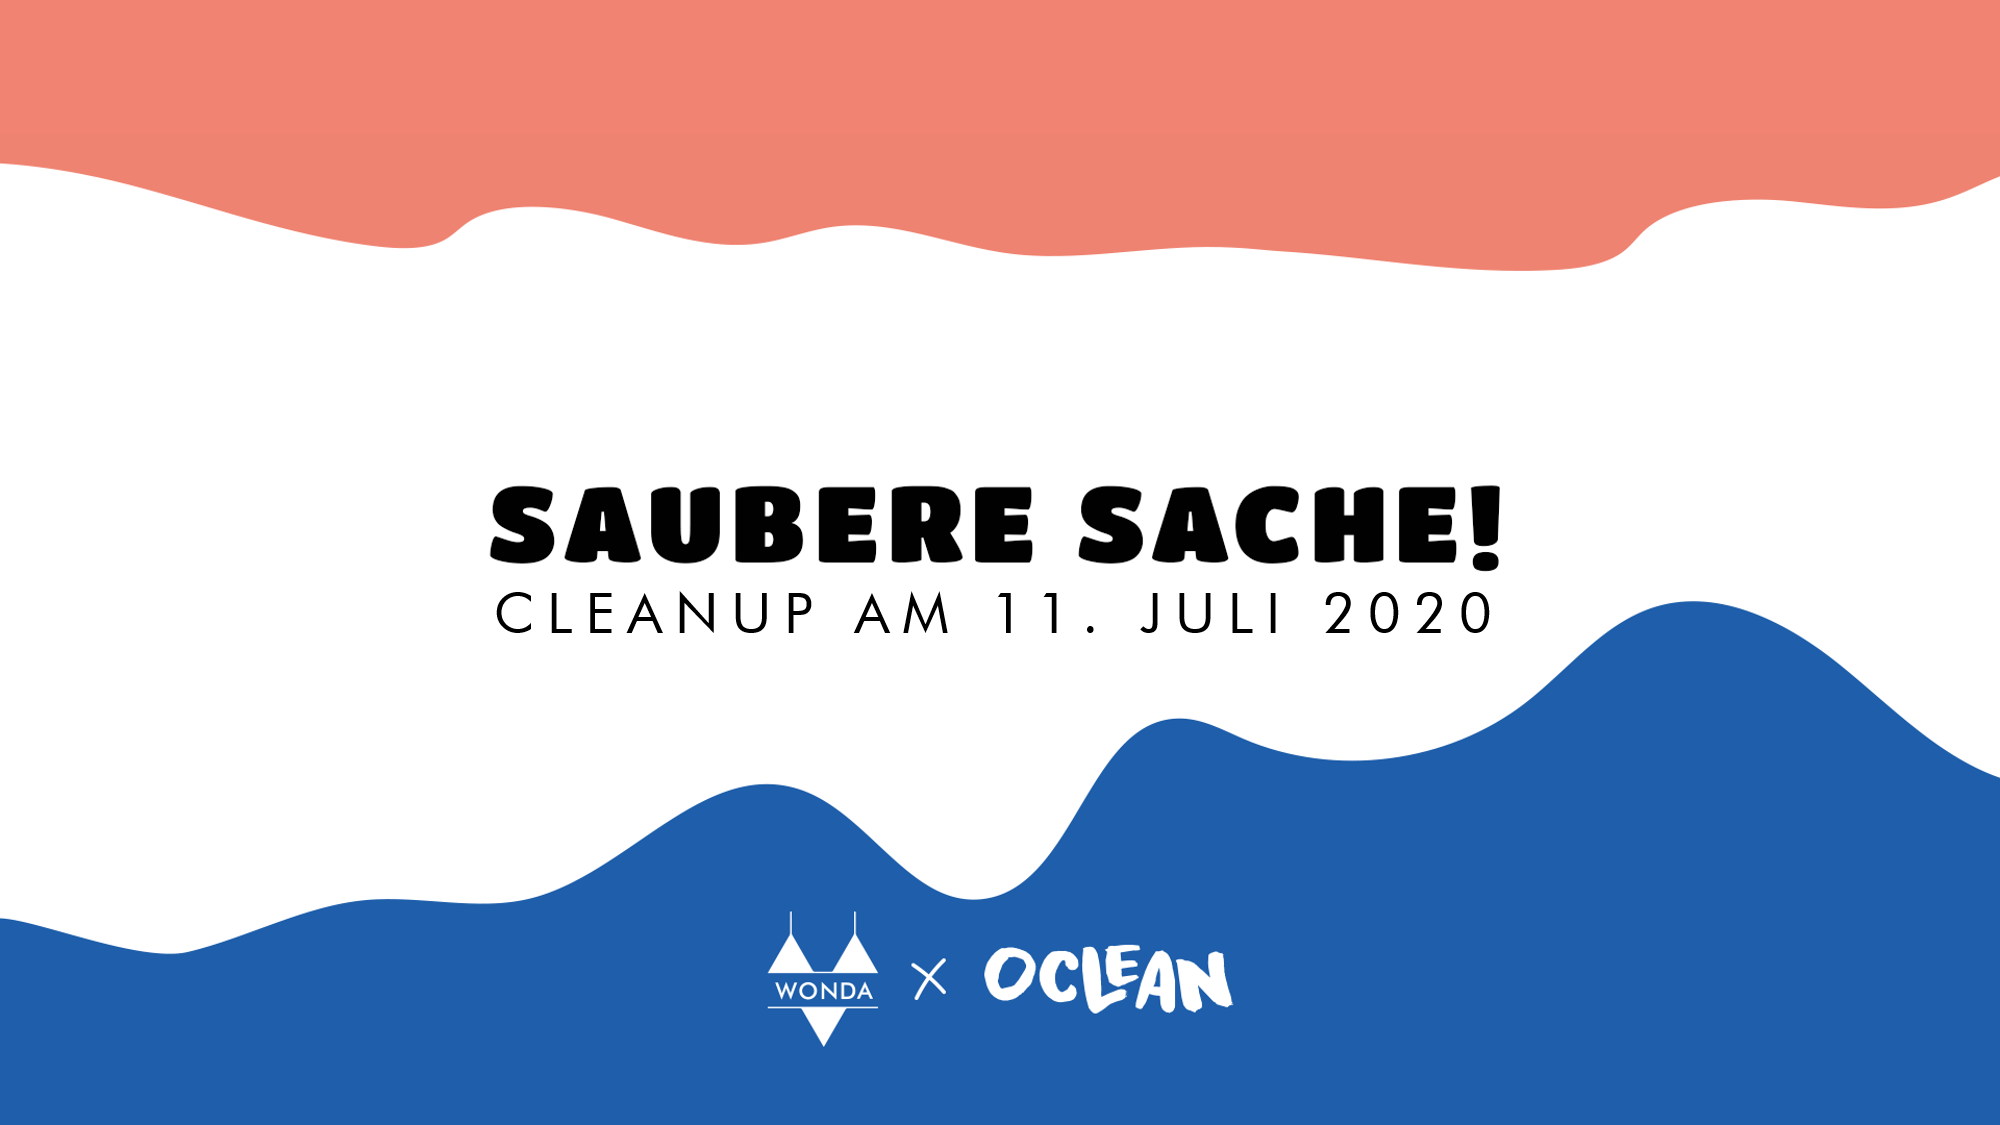 Event header saubere sache cleanup event hamburg im Juli 2020